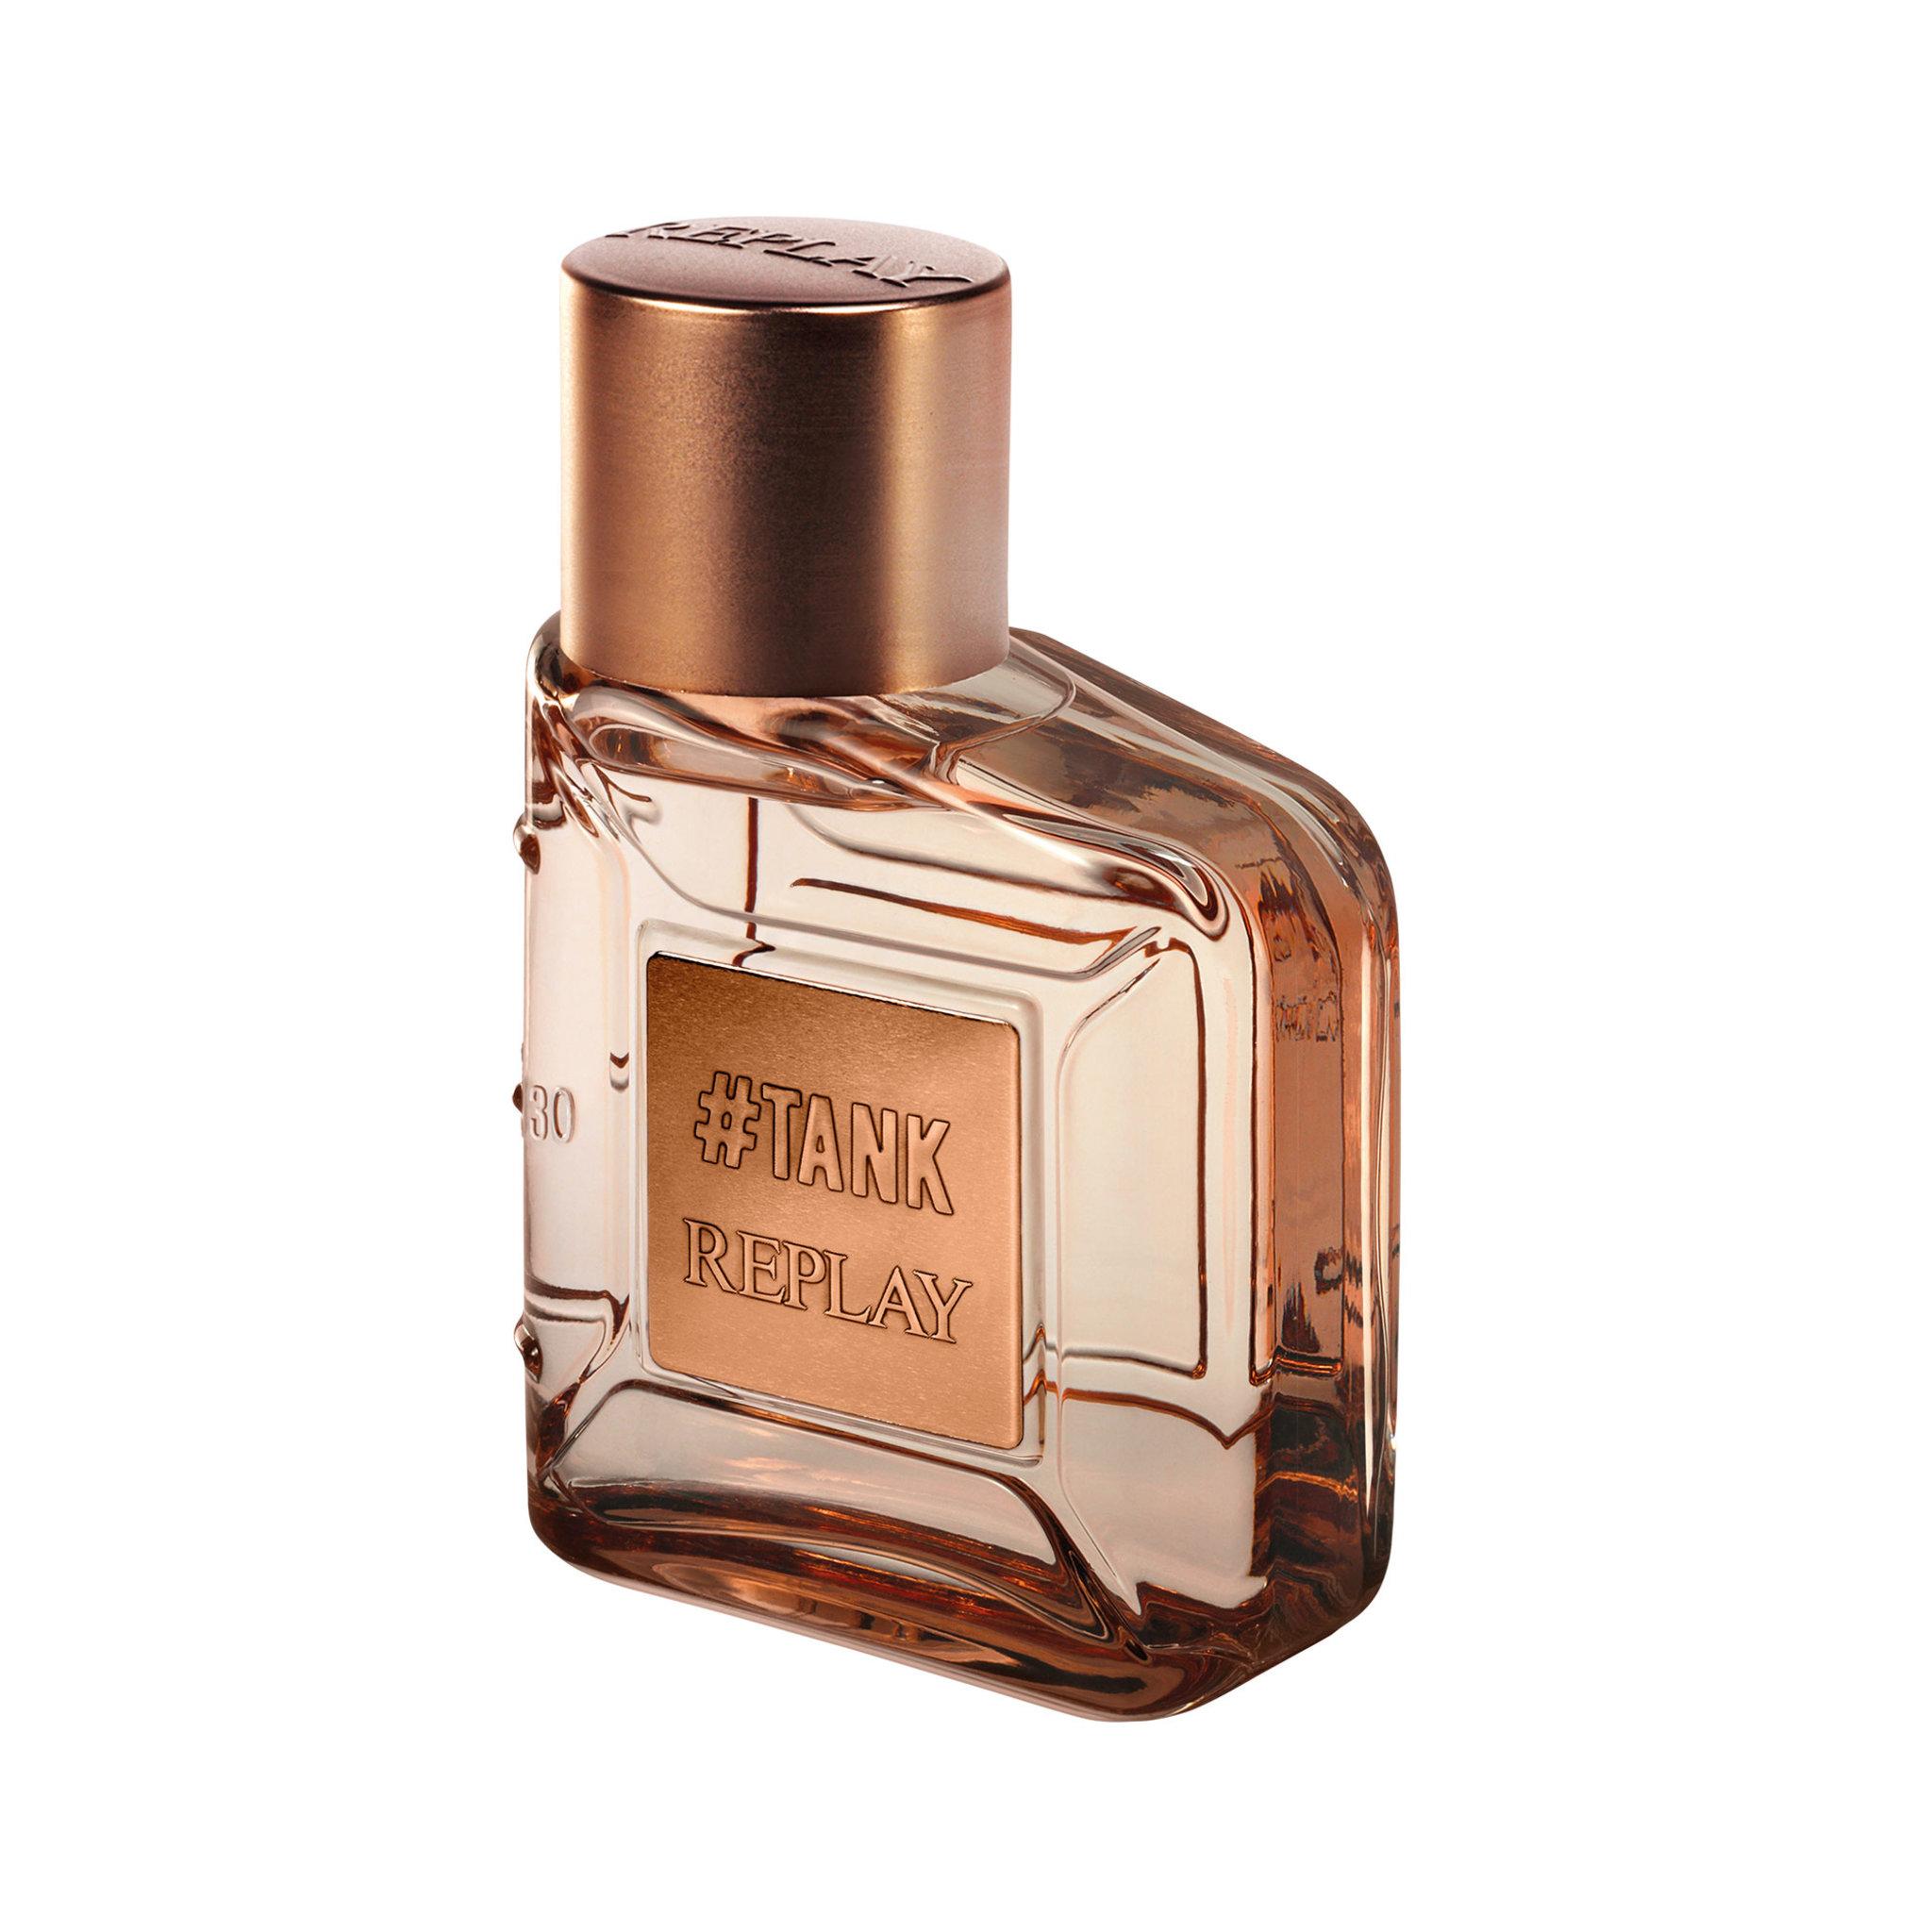 Köp Your Fragrance EdT, 75 ml Replay Parfym fraktfritt över